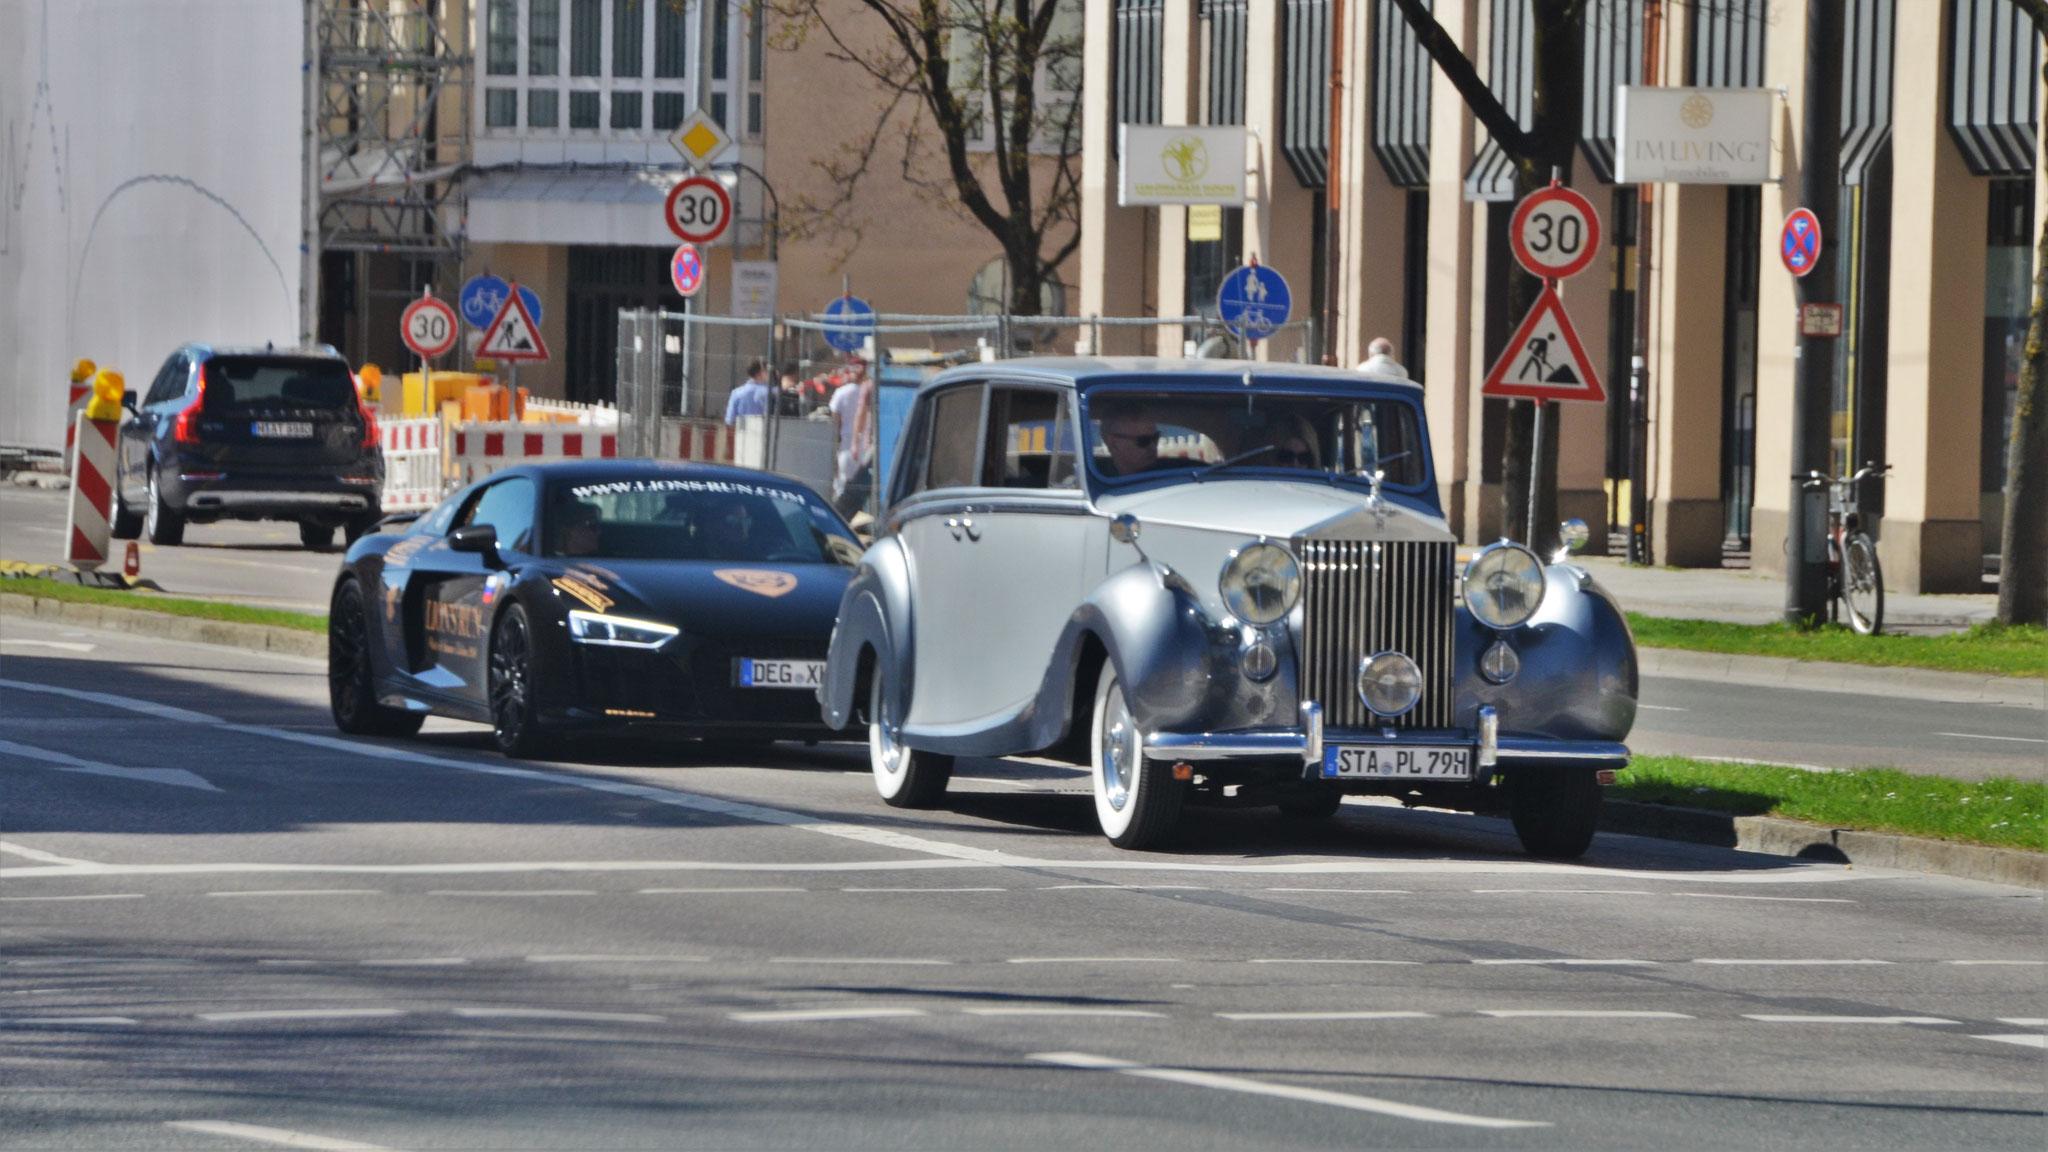 Rolls Royce Silver Cloud I - STA-PL-79H